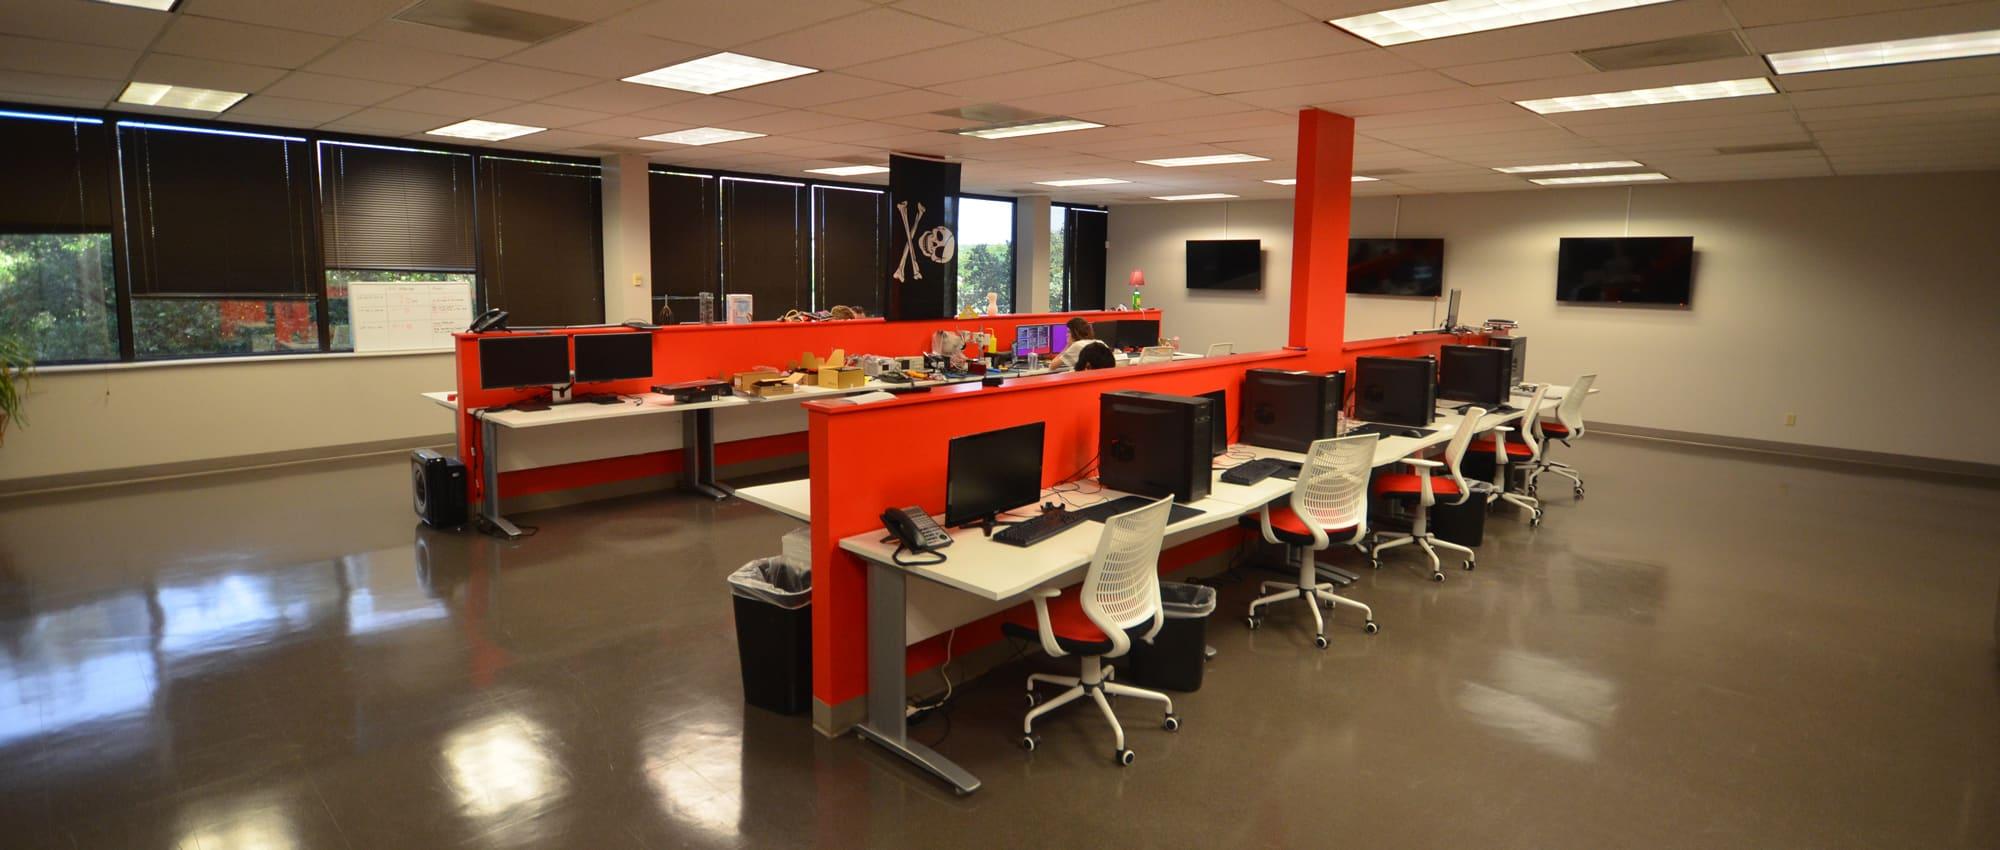 Sublease: Austin Oaks Travis Building Office Space | 3520 Executive Center Drive in Austin, Texas